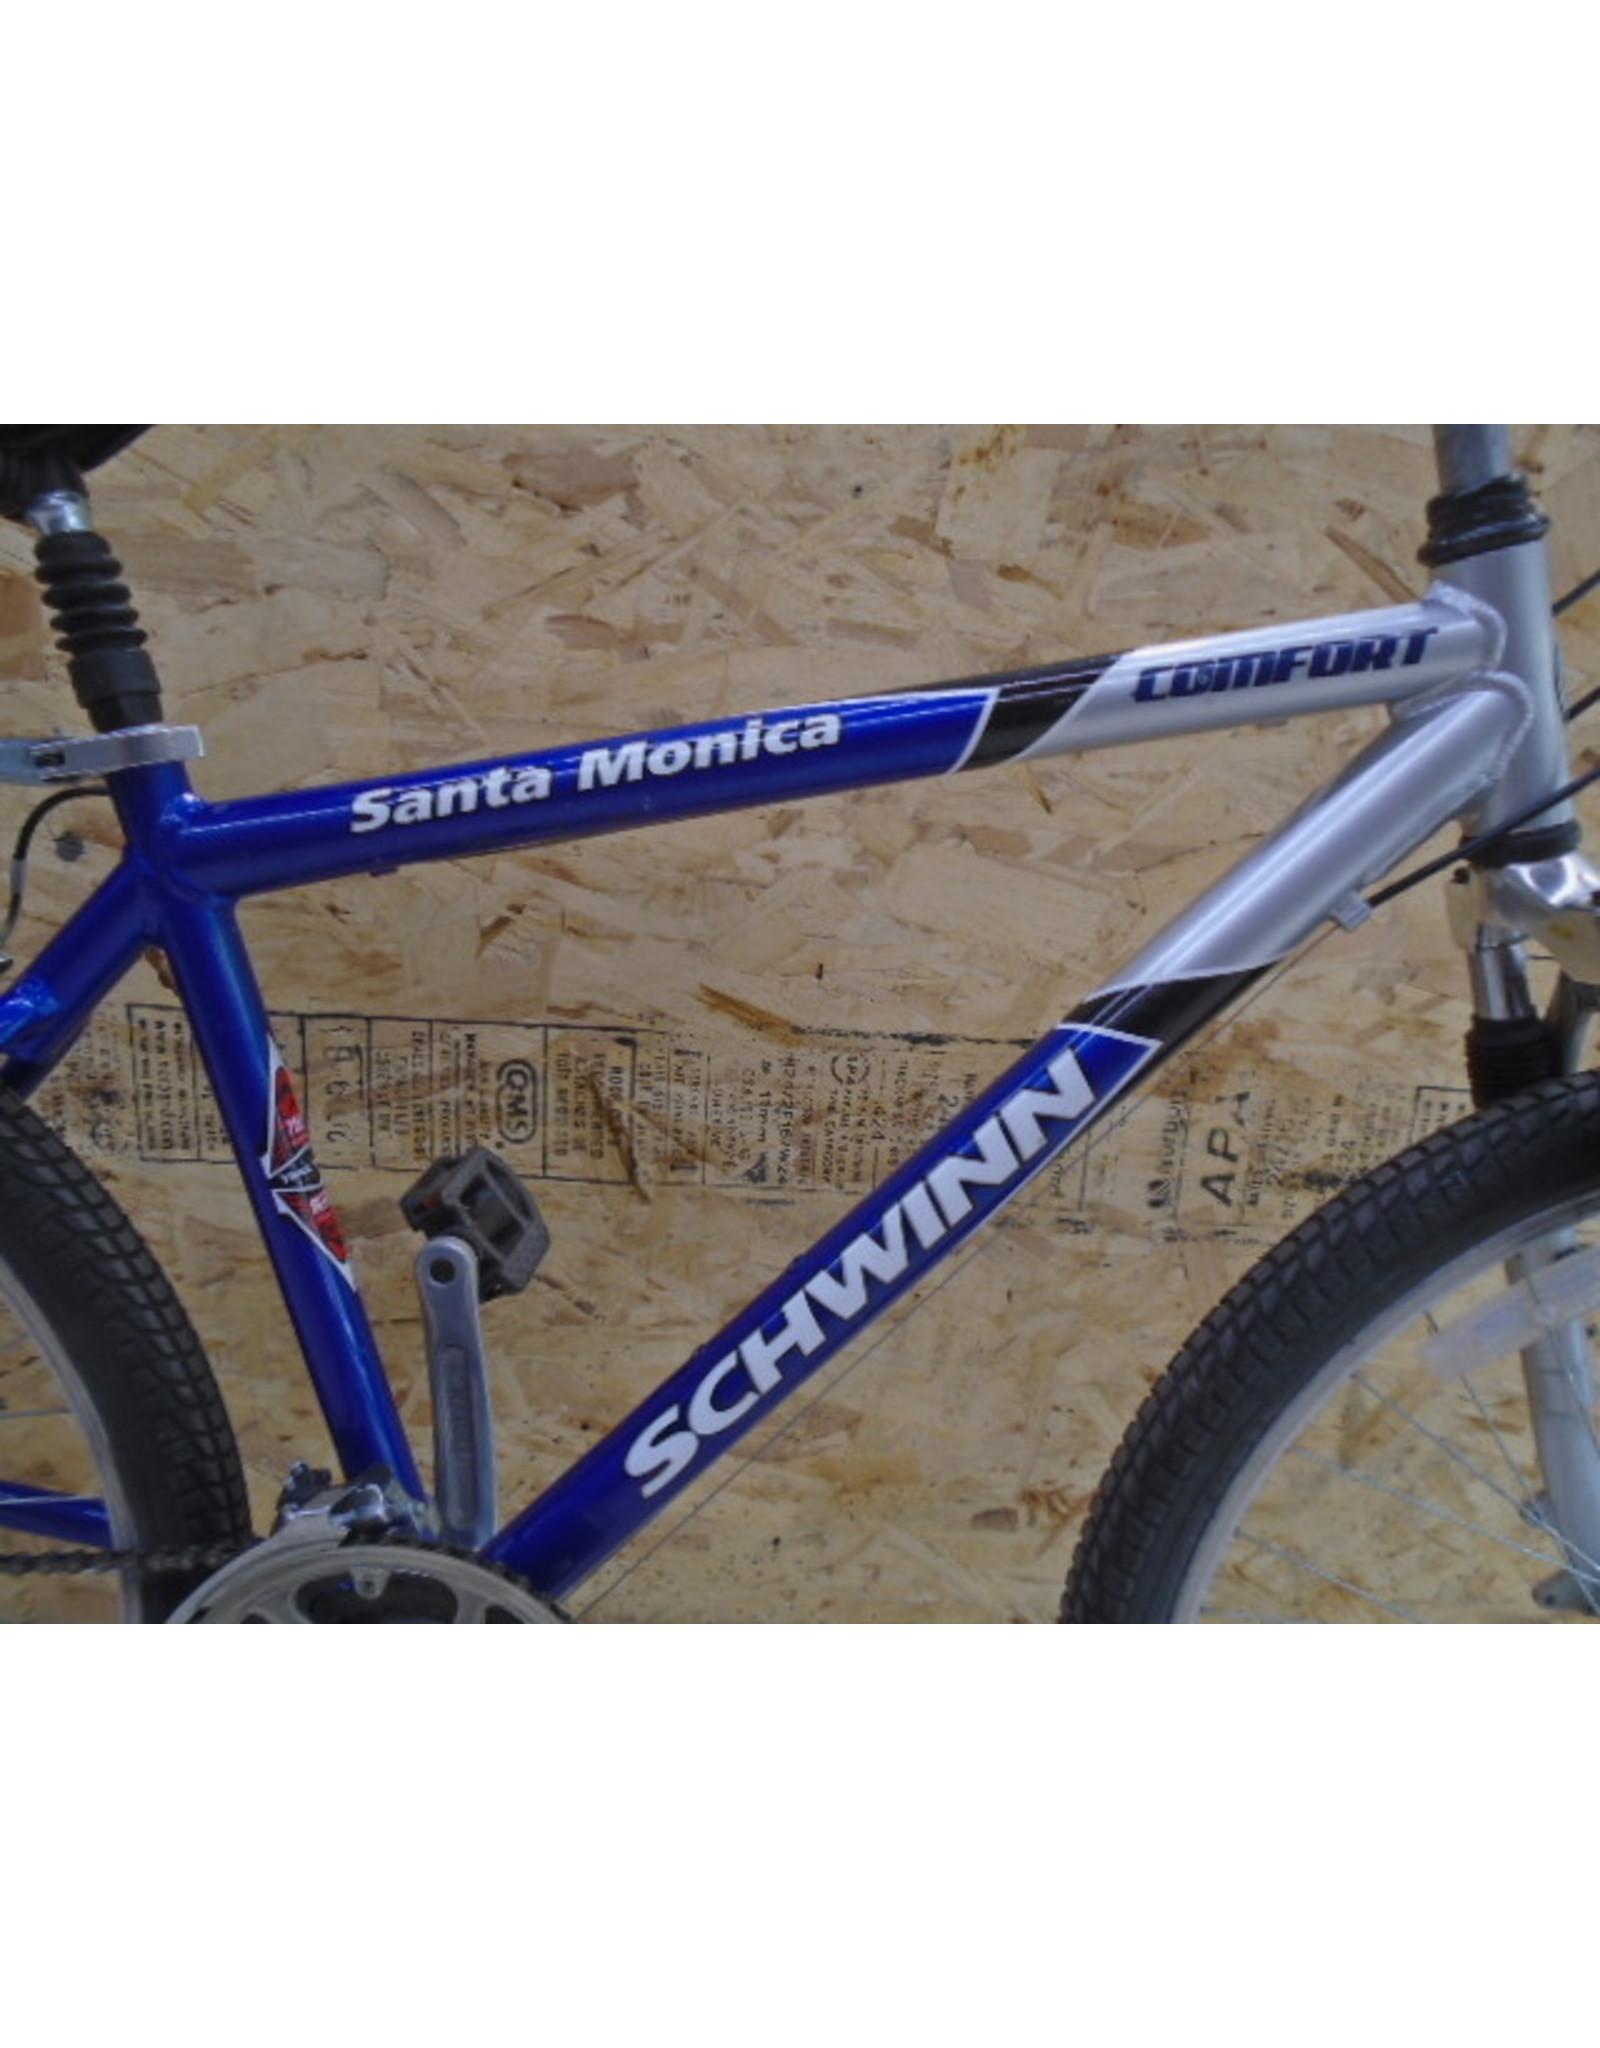 "Vélo usagé de montagne Schwinn 18"" - 9901"